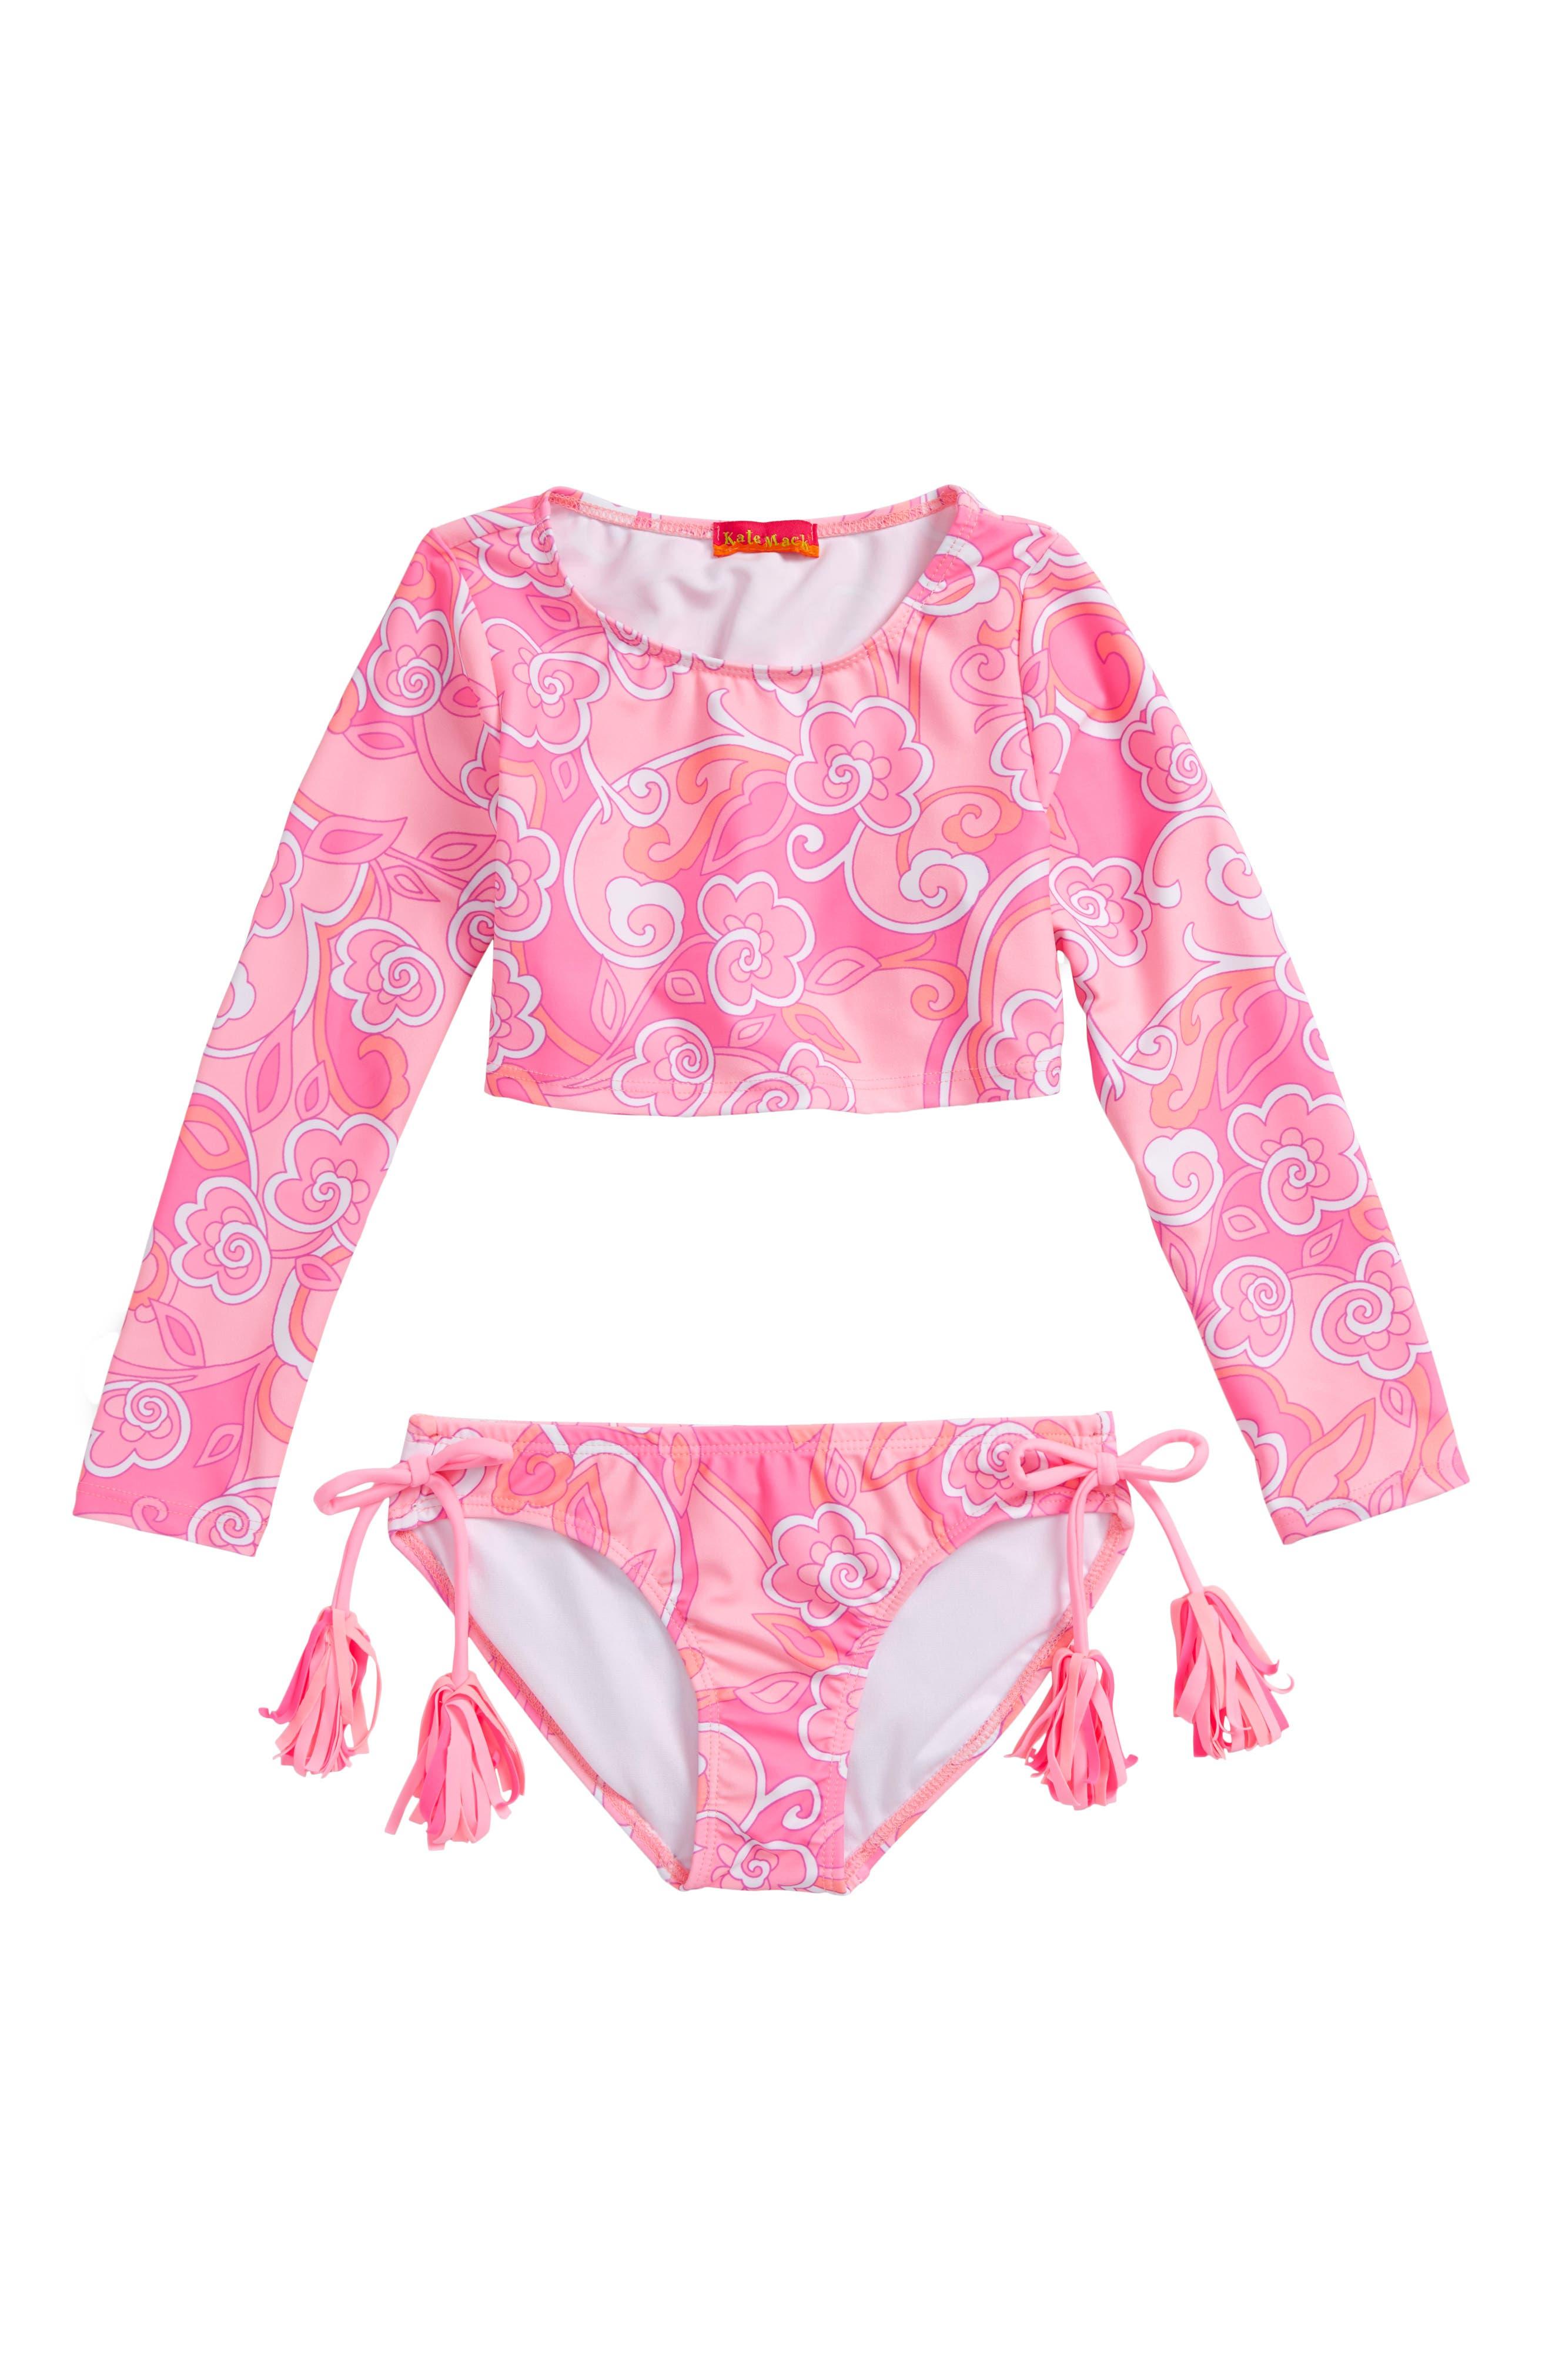 Alternate Image 1 Selected - Kate Mack Two-Piece Rashguard Swimsuit (Little Girls)